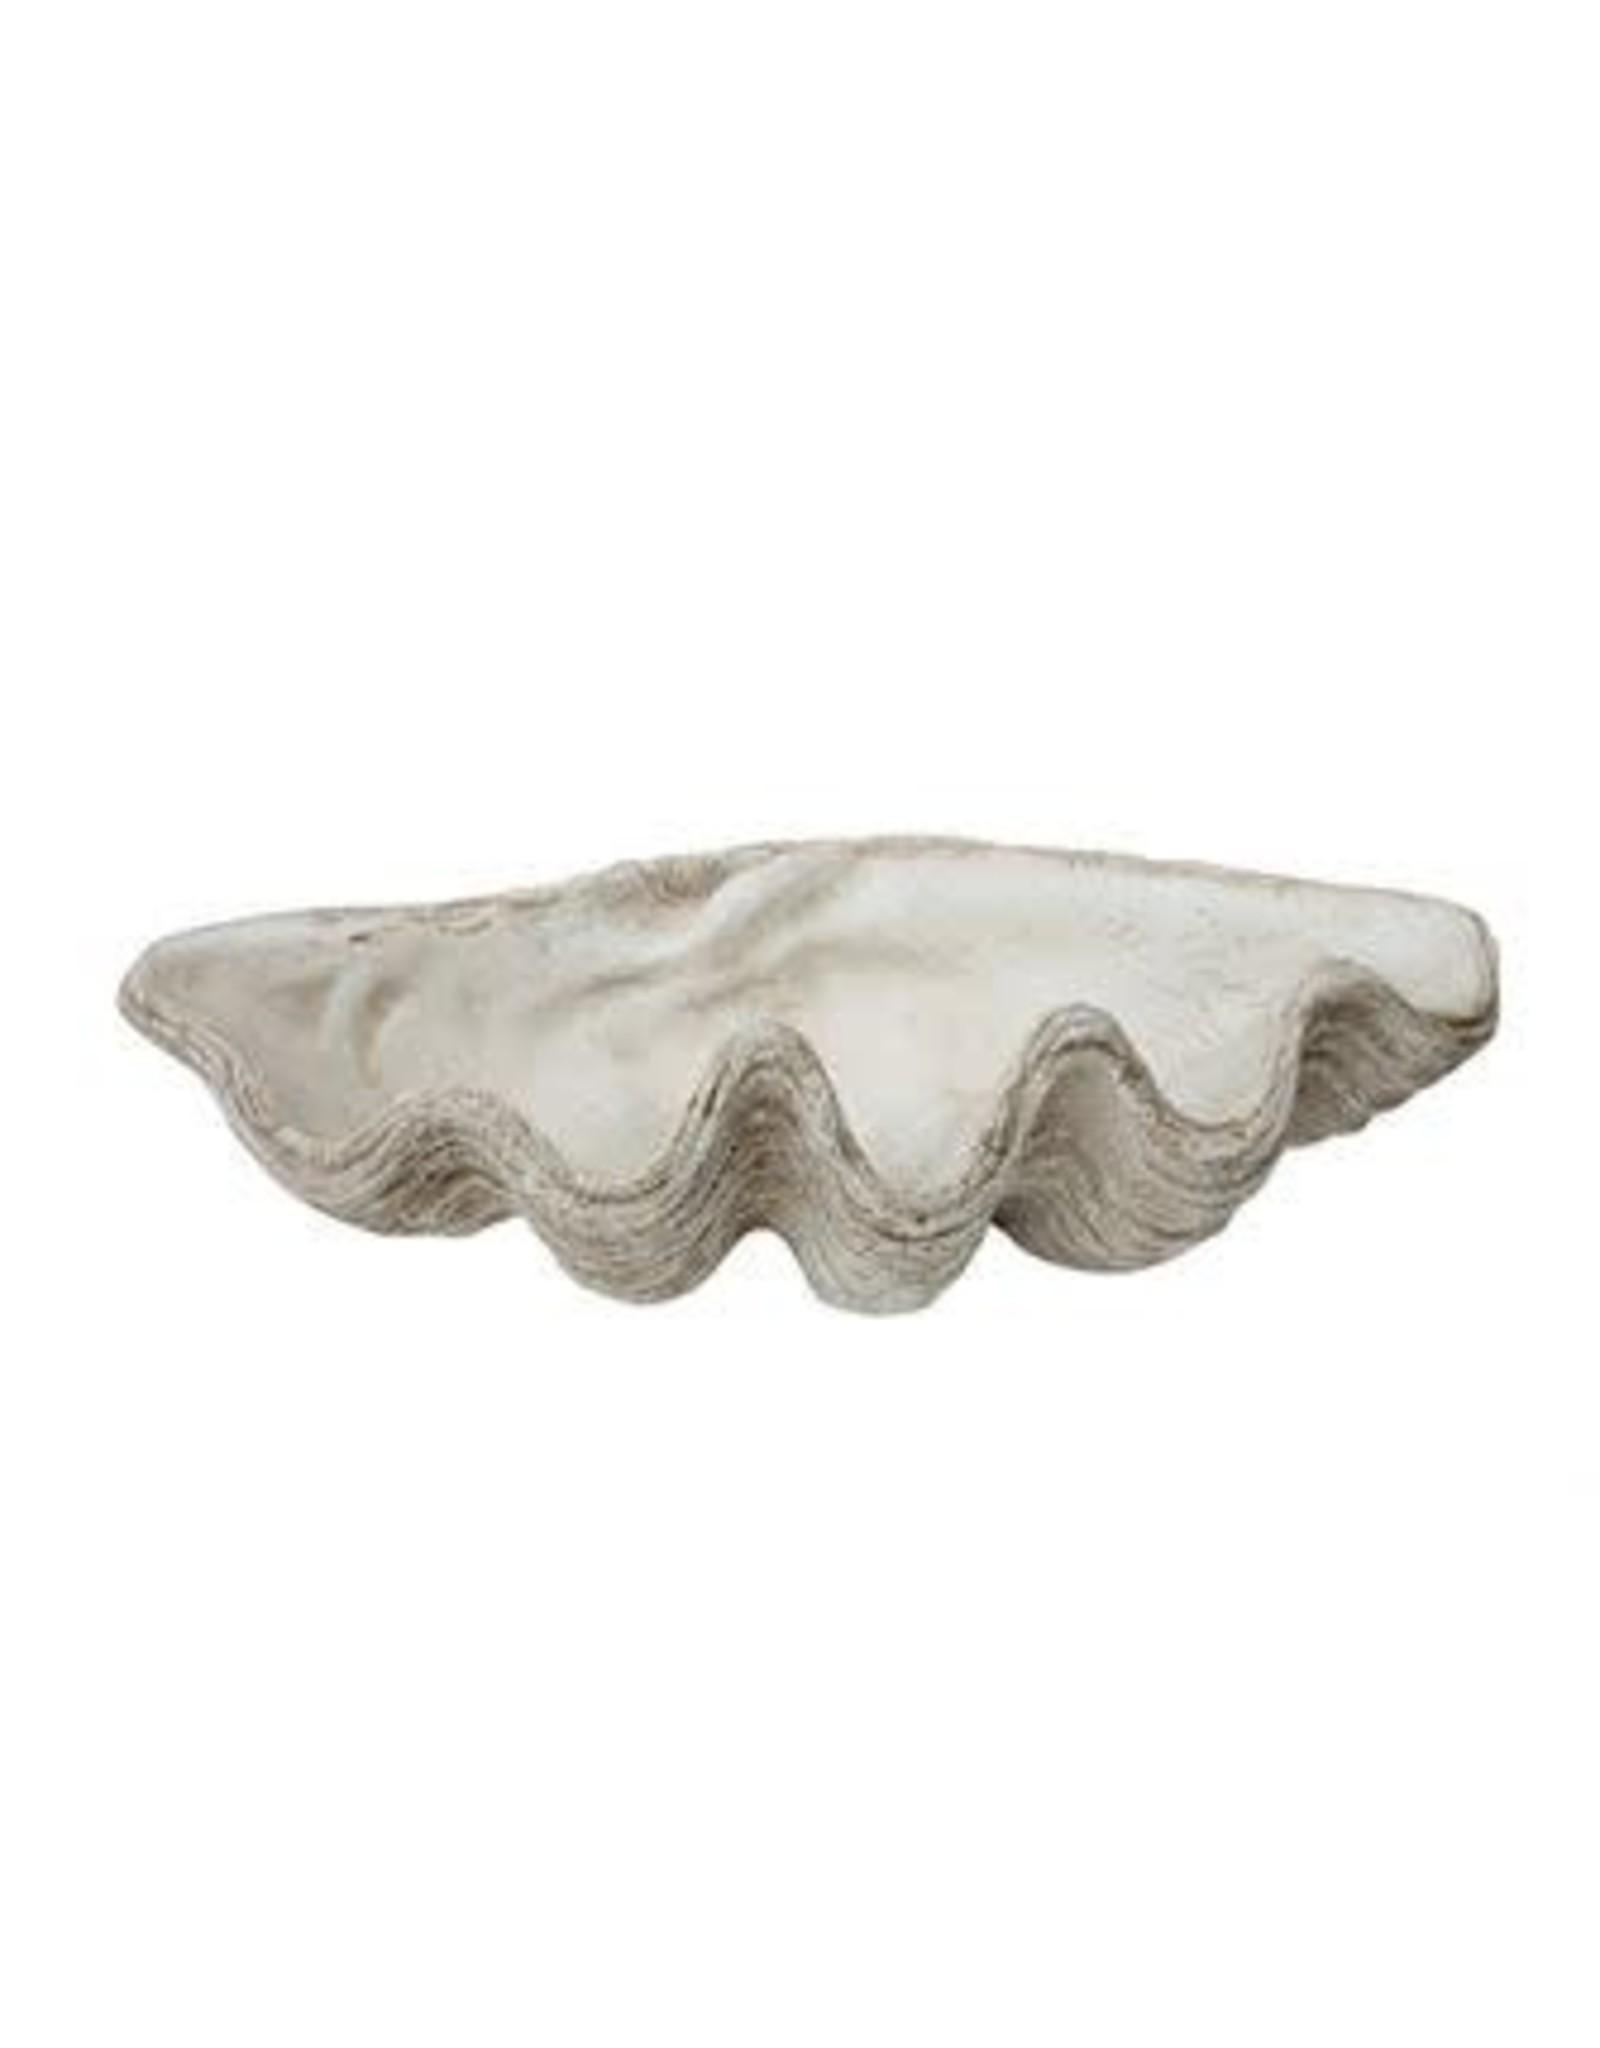 Magnesia Seashell